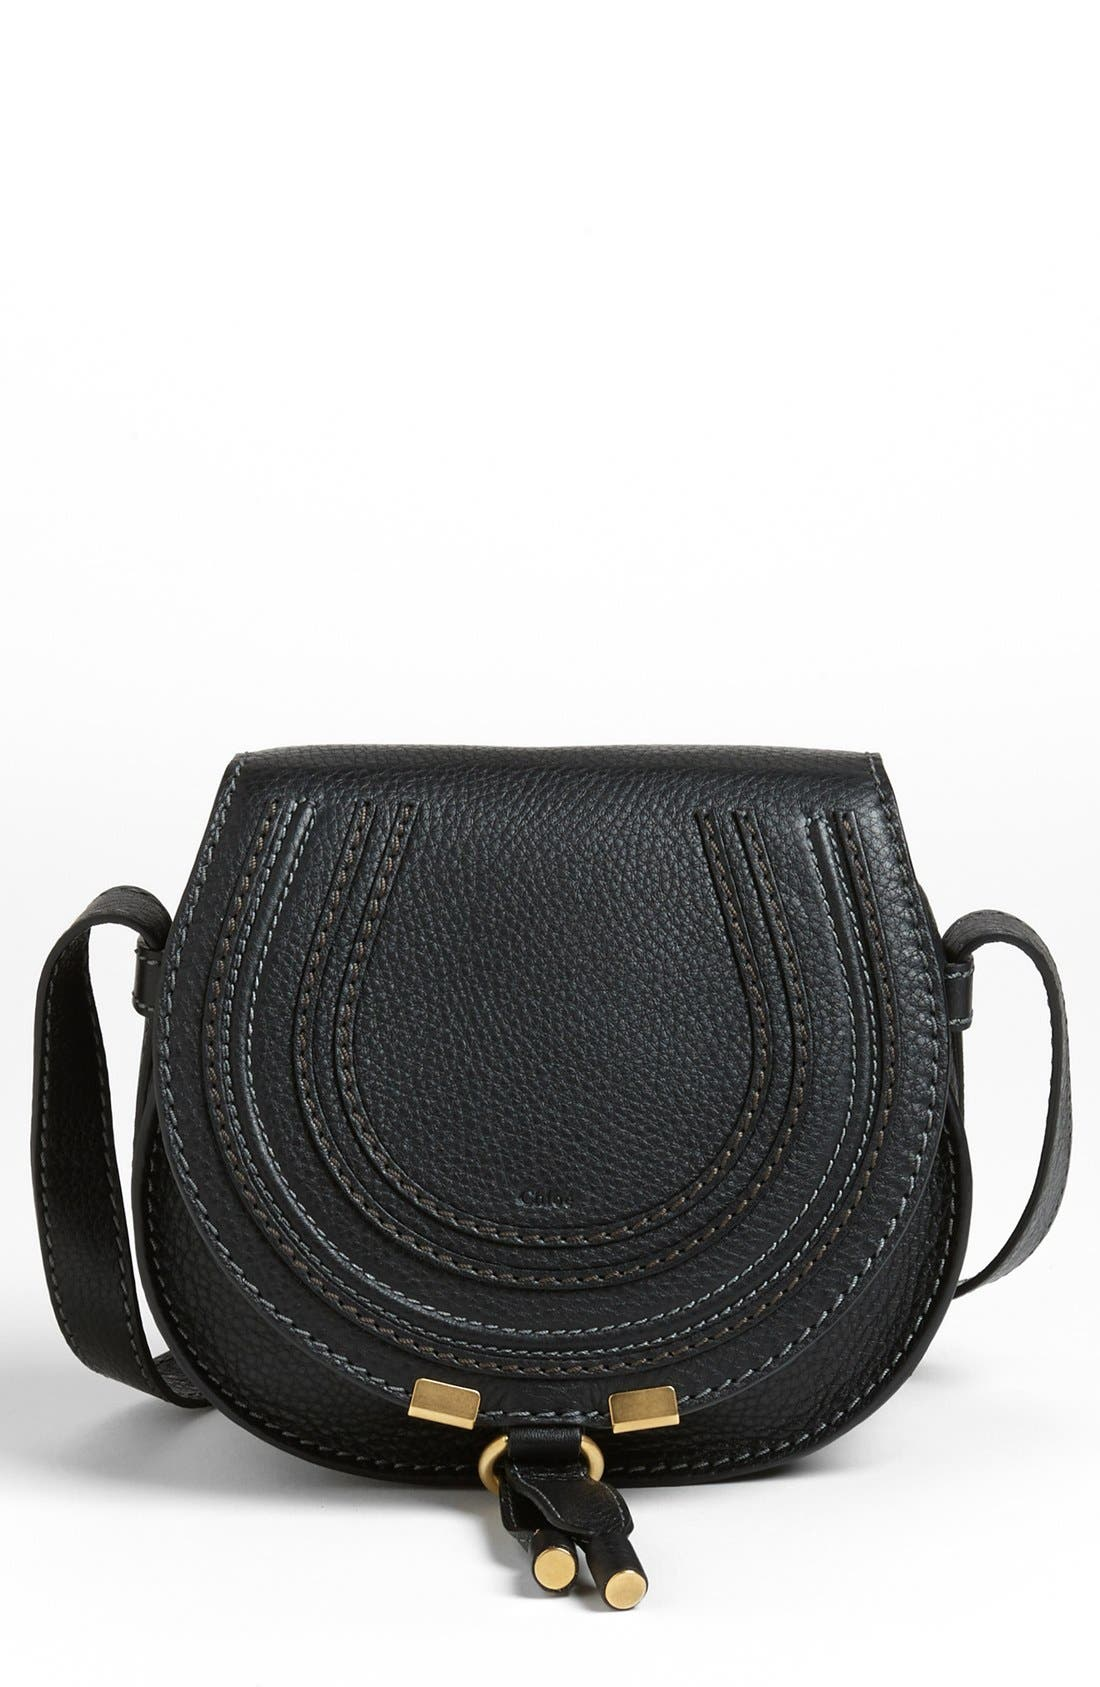 Alternate Image 1 Selected - Chloé 'Mini Marcie' Leather Crossbody Bag